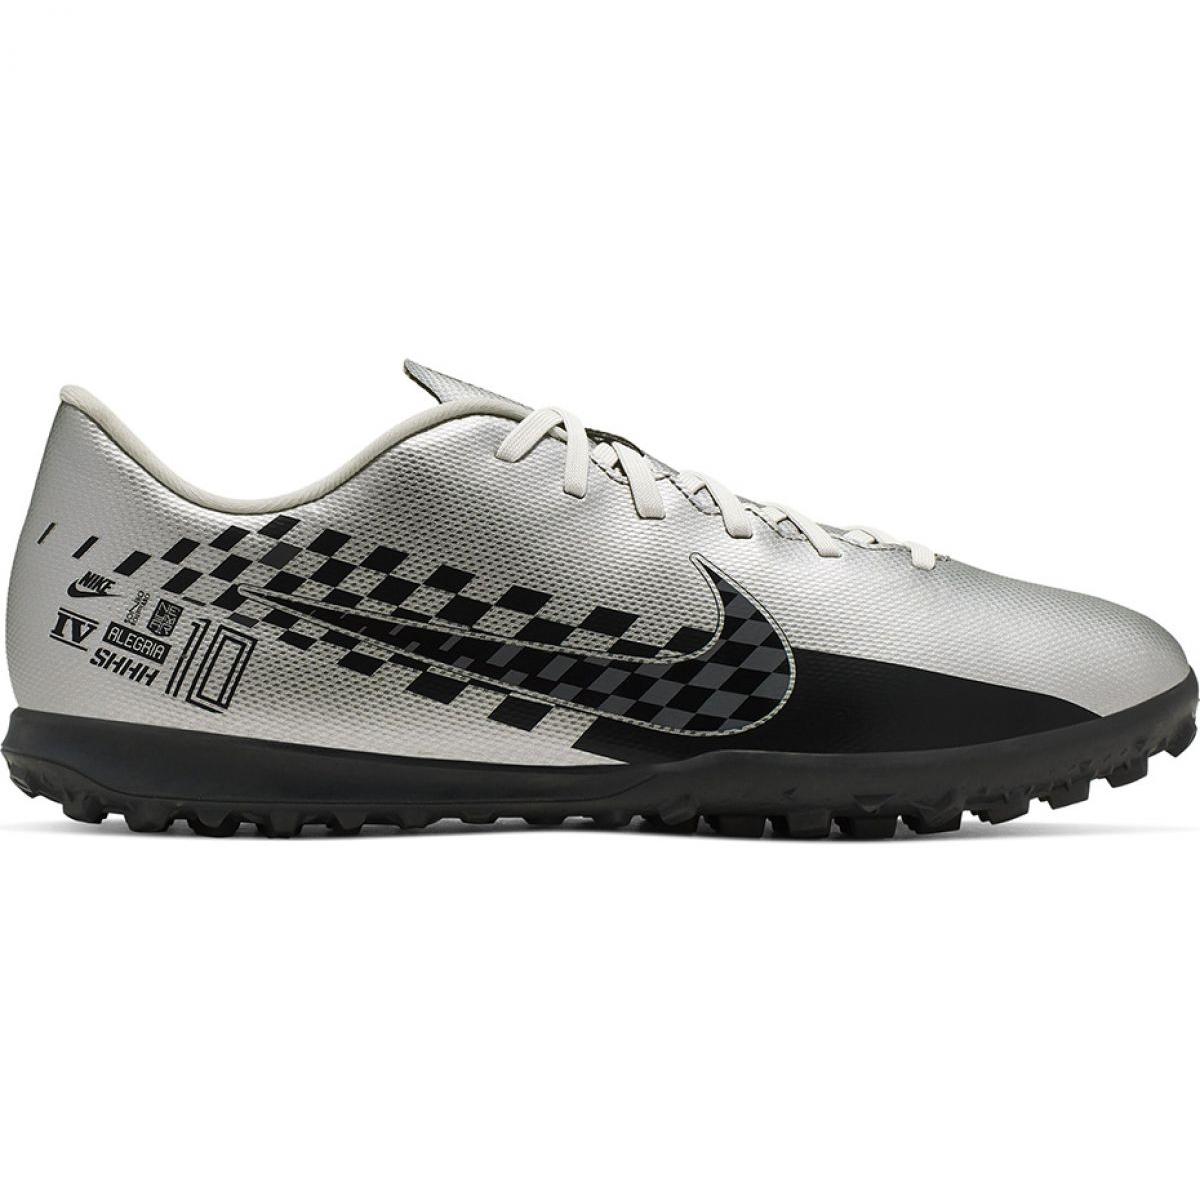 Nike Mercurial Vapor 13 Neymar Tf M At8000 006 Fussballschuhe Silber Grau Silber